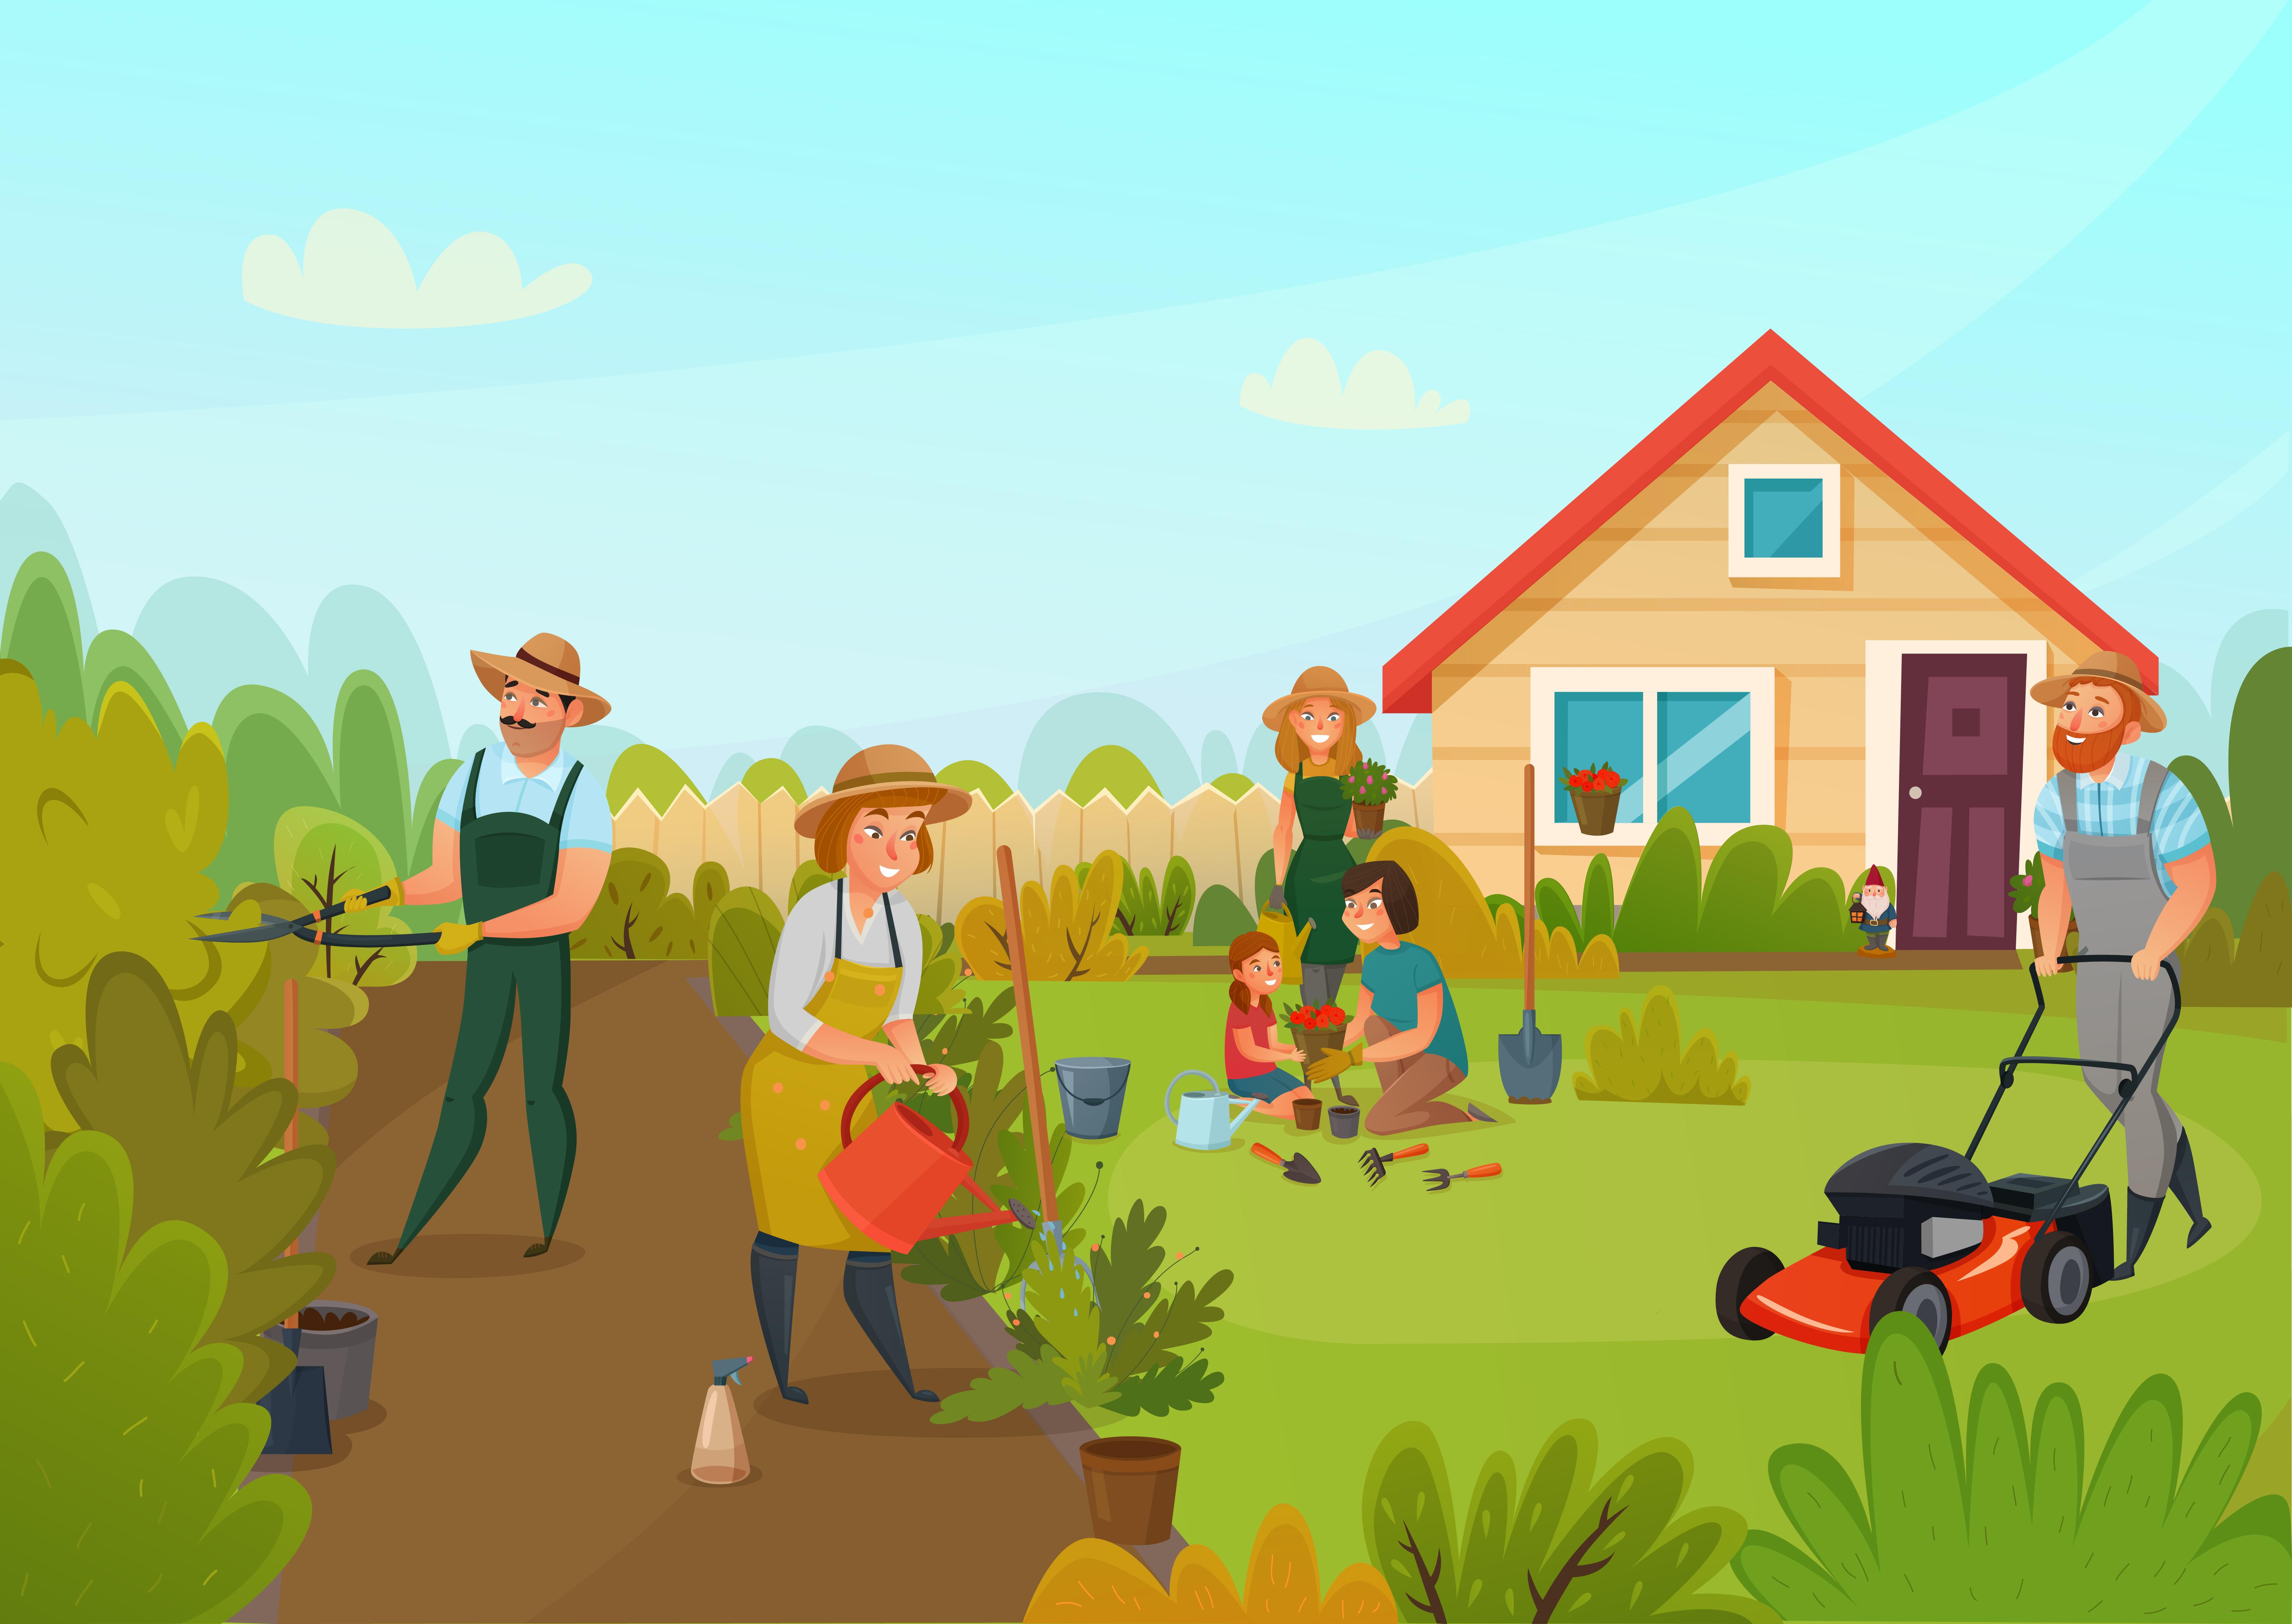 Gardening Cartoon Composition - Download Free Vectors ...